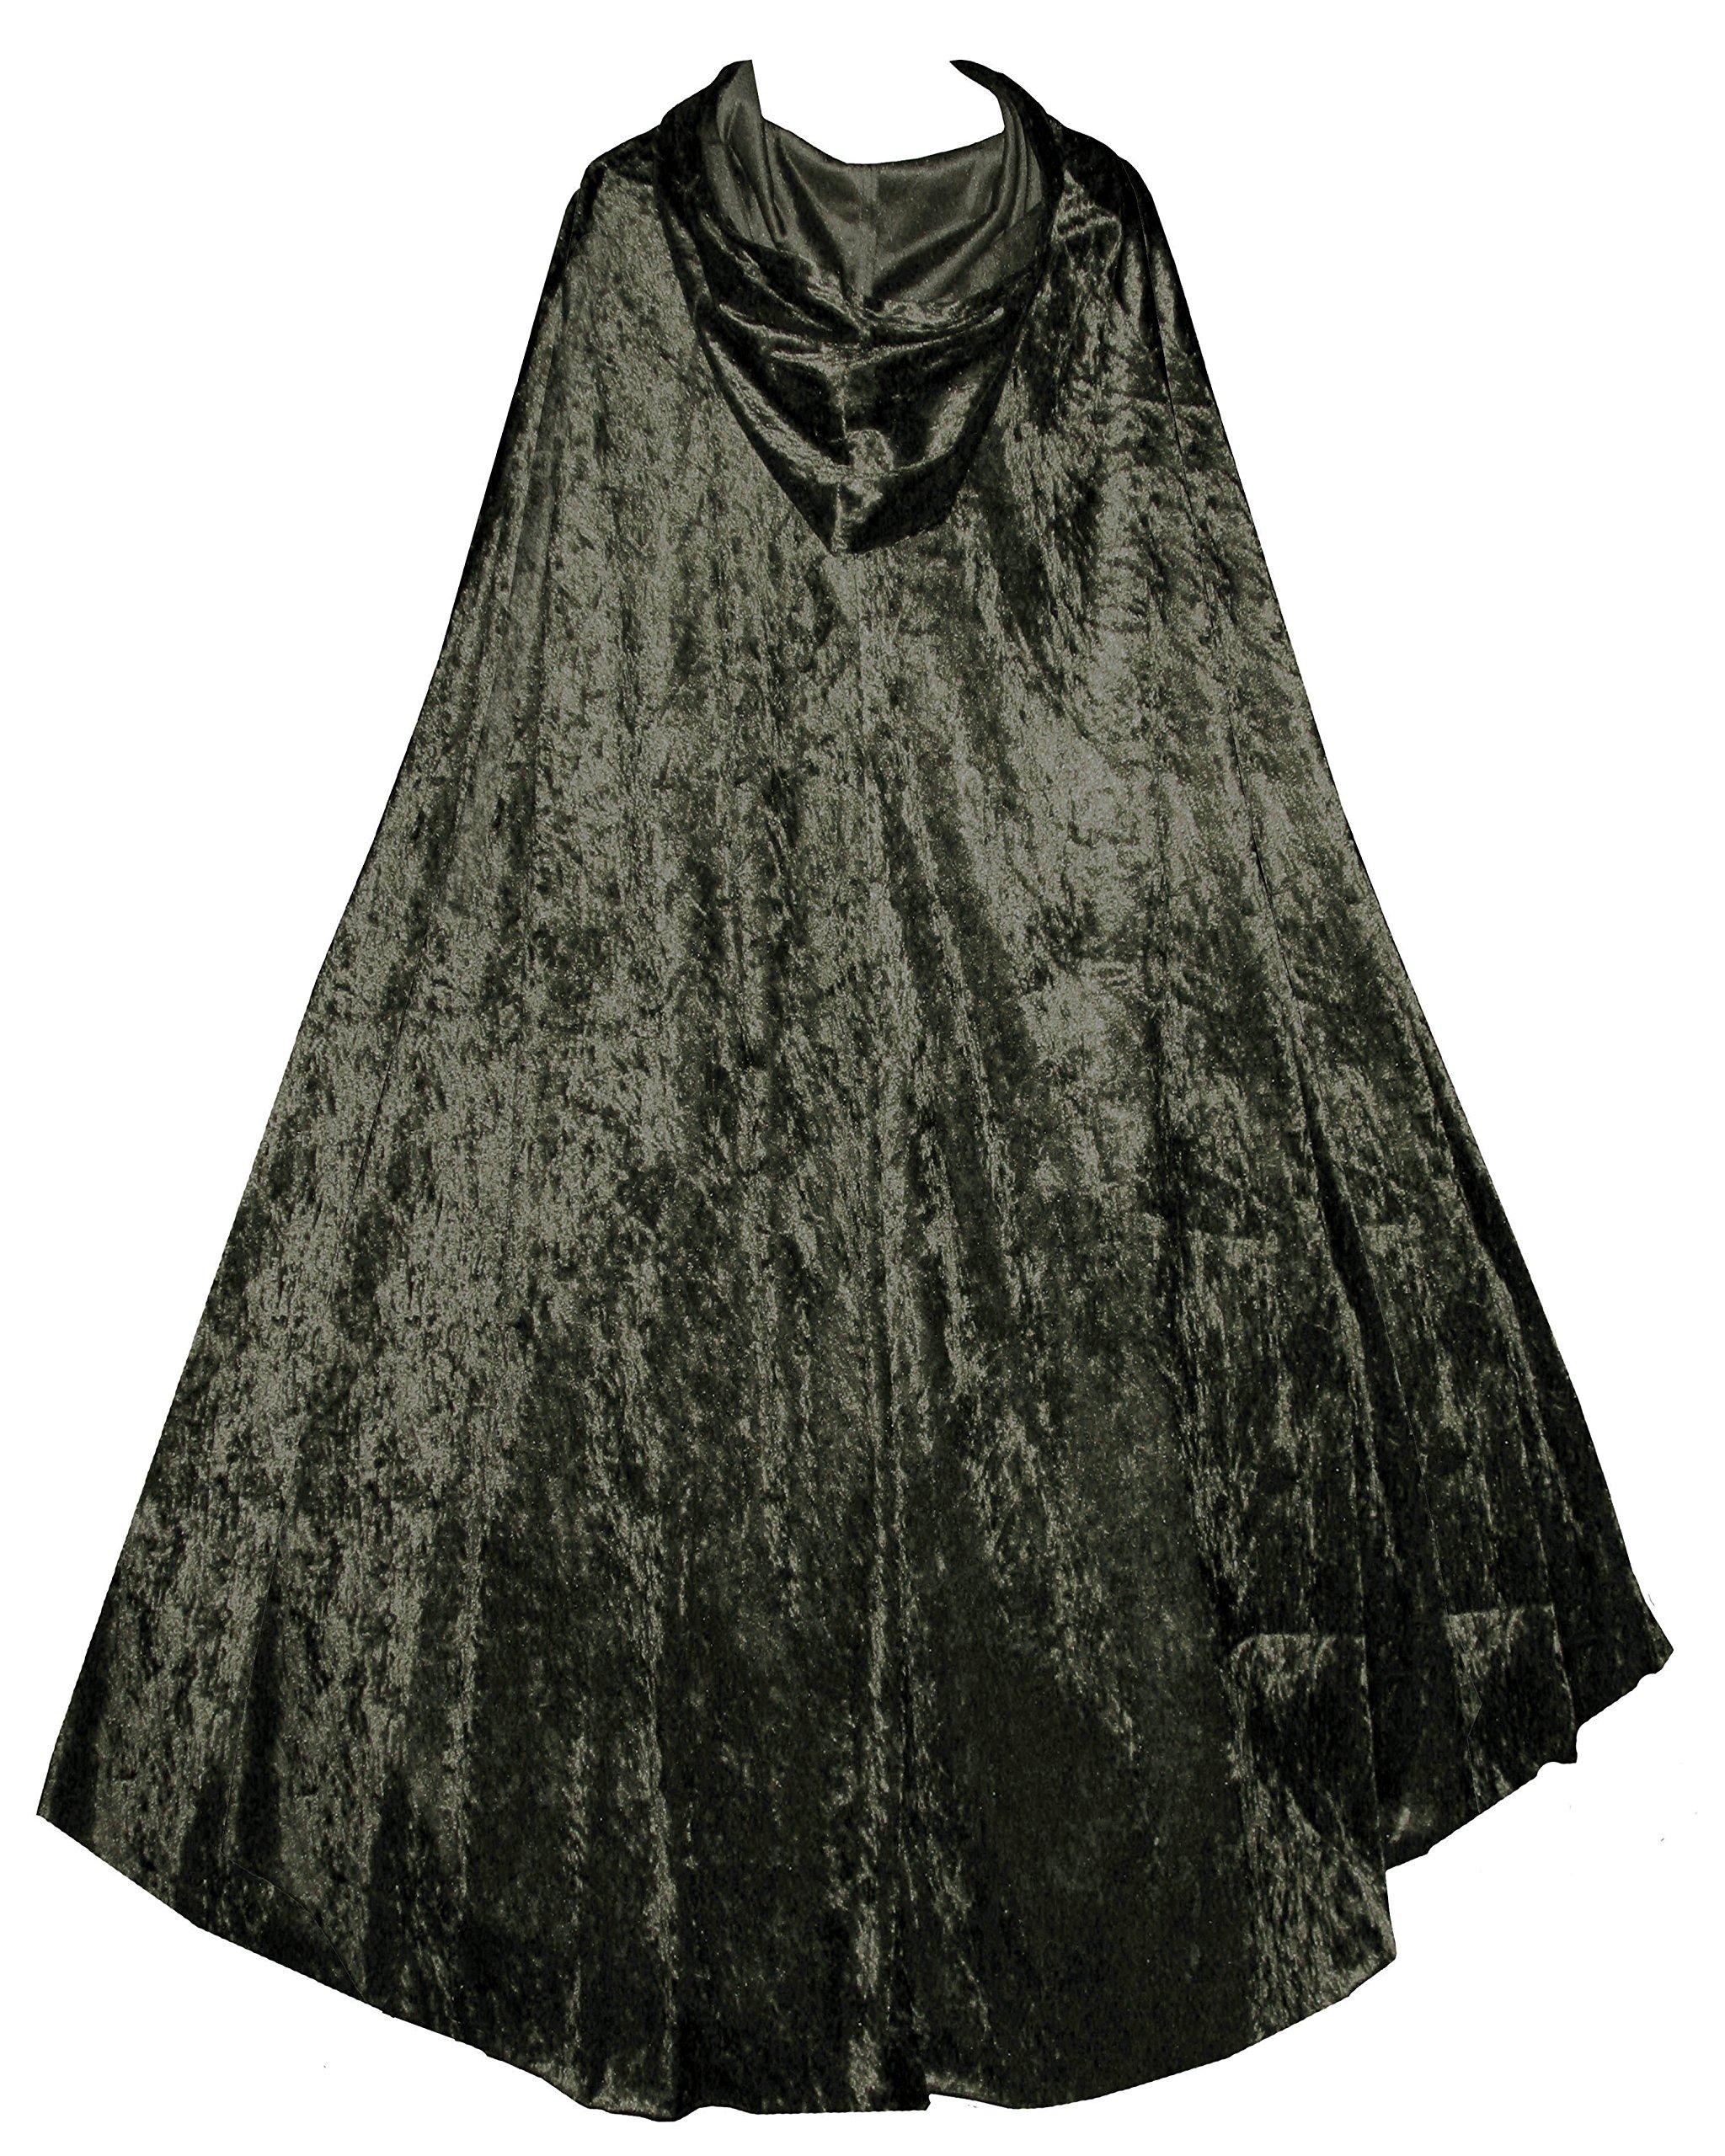 Victorian Vagabond Gothic Renaissance Steampunk Velvet Cape Cloak Olive Green 4